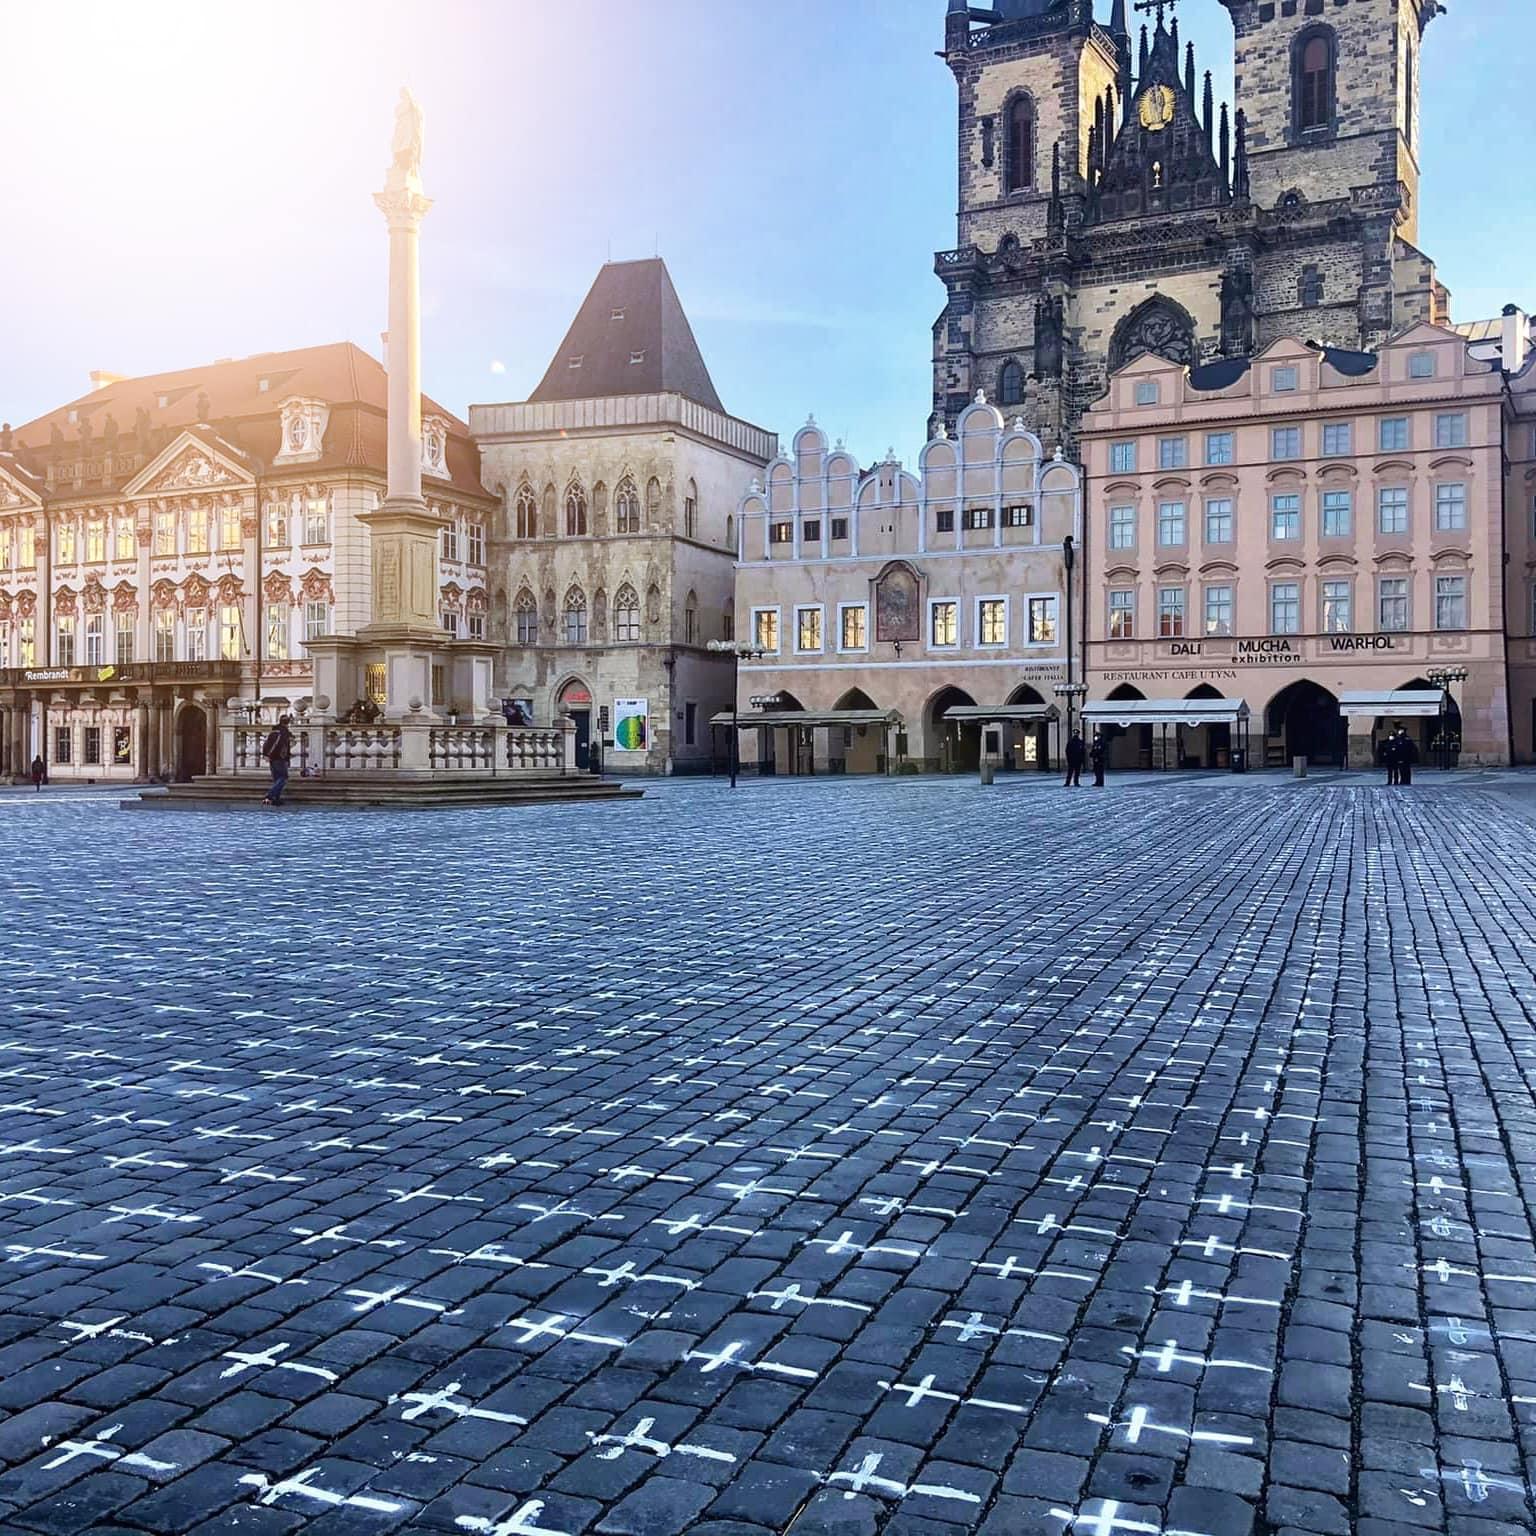 Foto: Hl. město Praha (https://twitter.com/PrahaEU/status/1373907374860292096)